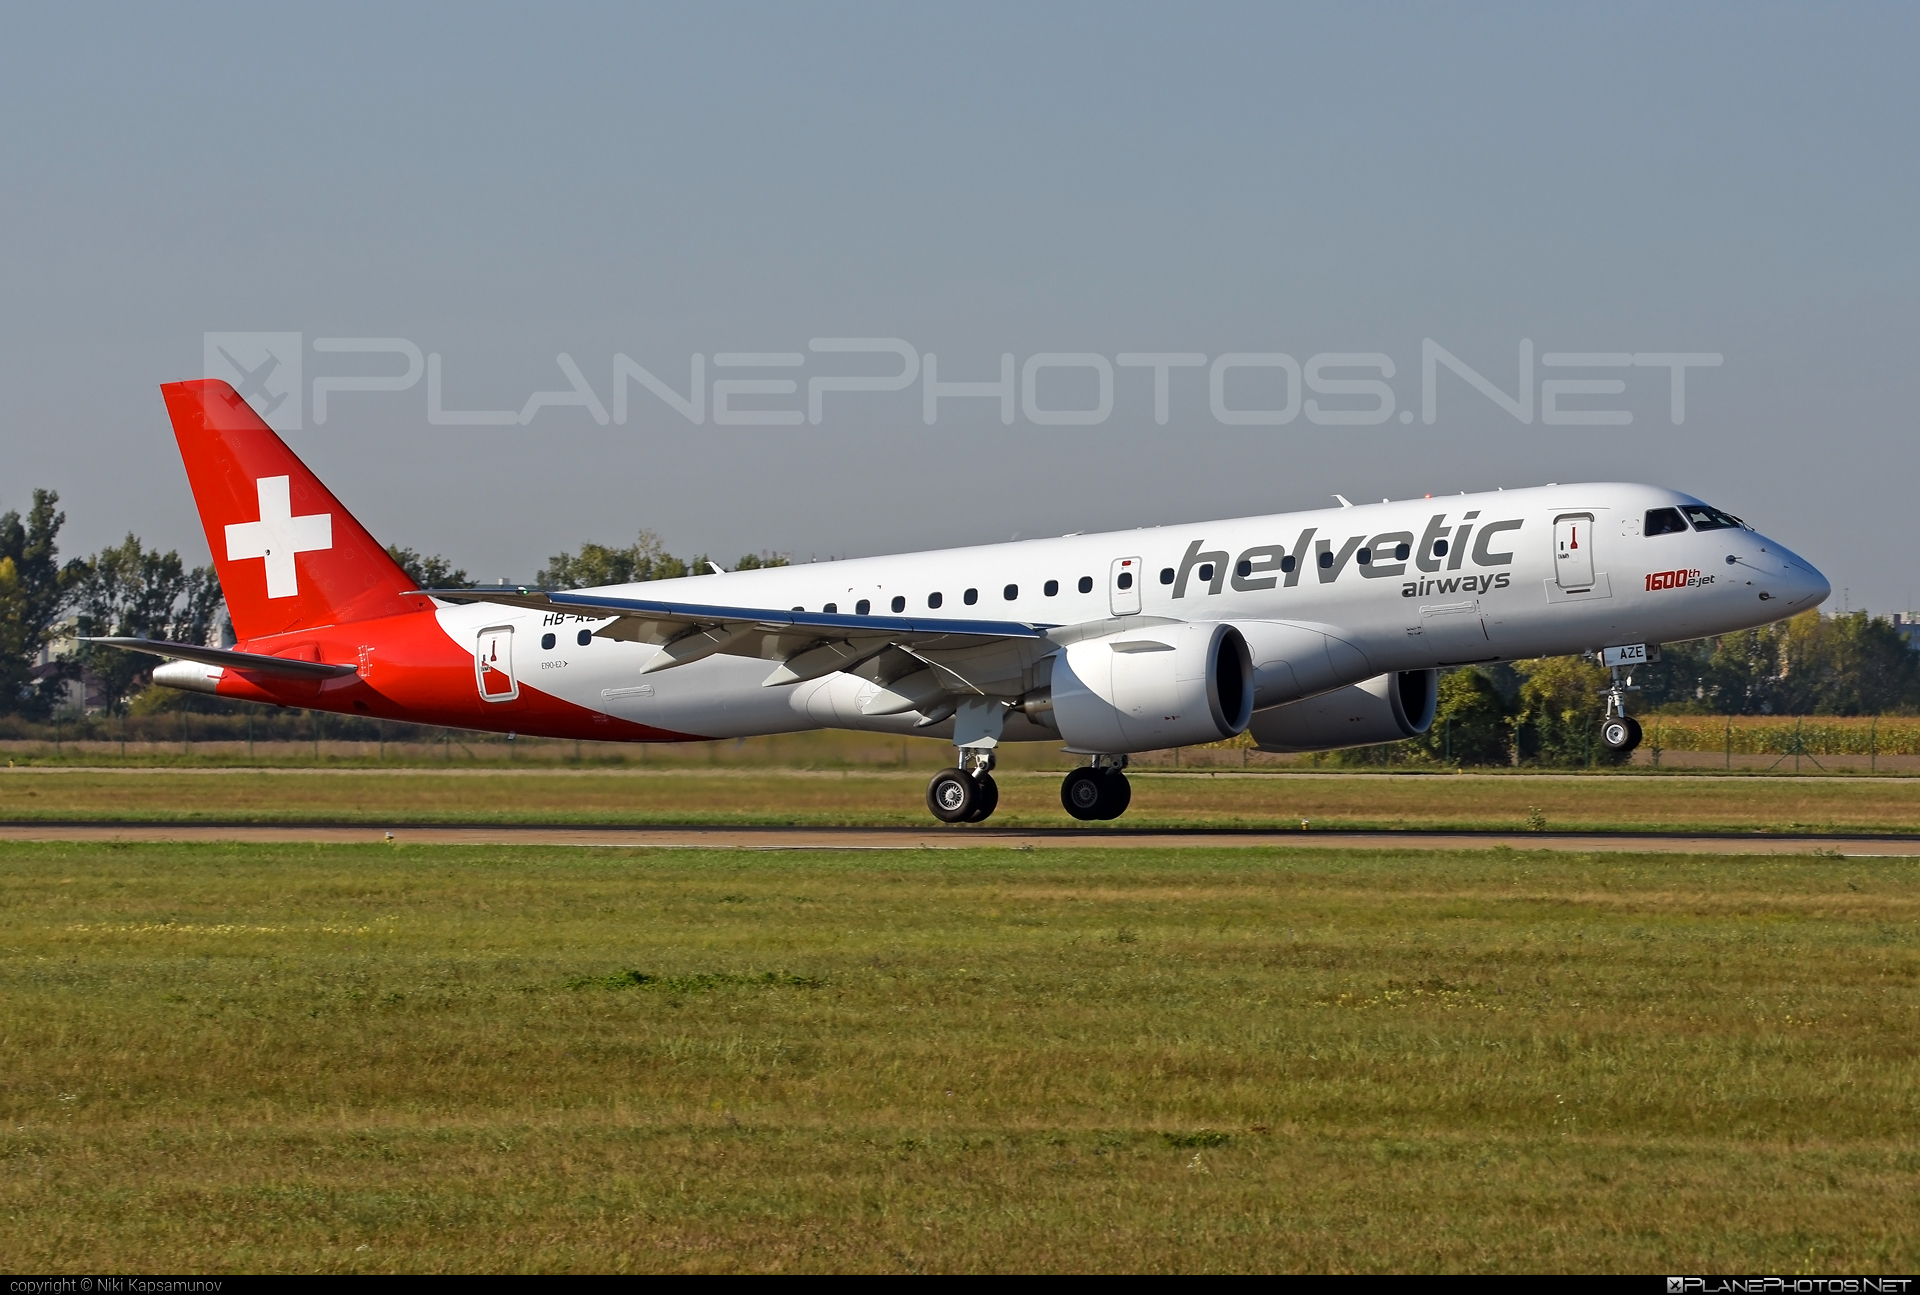 Embraer E190-E2 (ERJ-190-300STD) - HB-AZE operated by Helvetic Airways #1600thejet #e190 #e190e2 #embraer #embraer190 #embraer190300 #embraer190300std #embraer190e2 #erj190300 #erj190300std